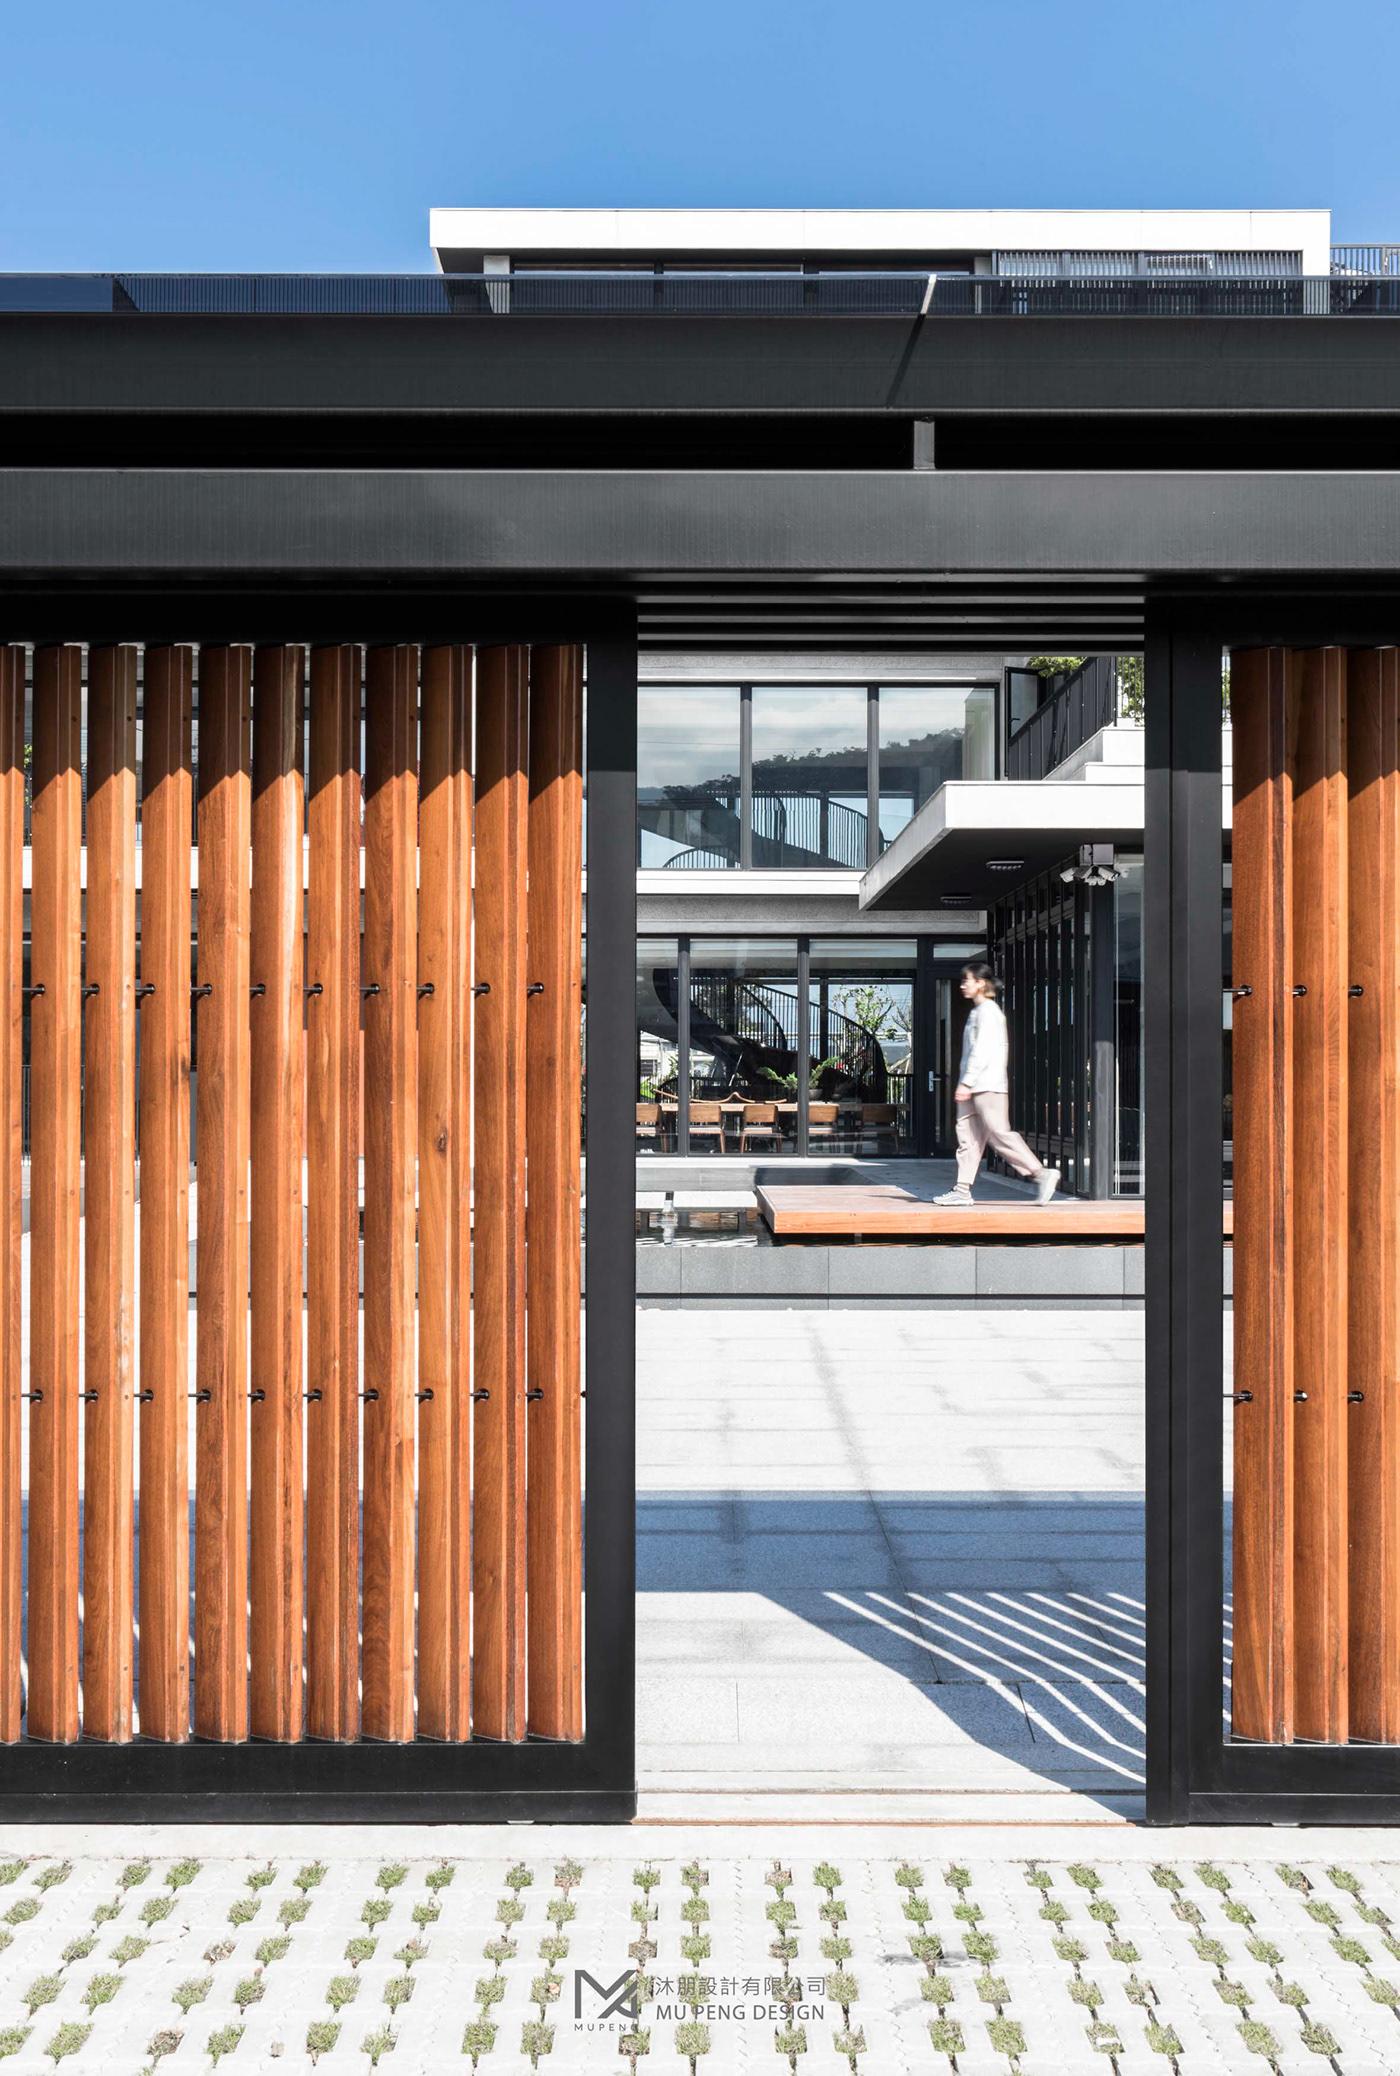 Image may contain: door, outdoor and window